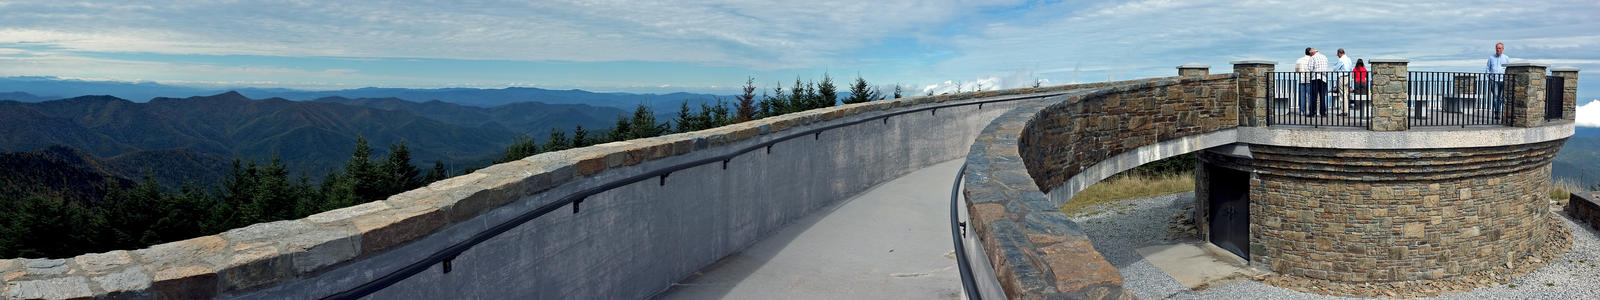 Mt. Mitchell Summit Panorama 4